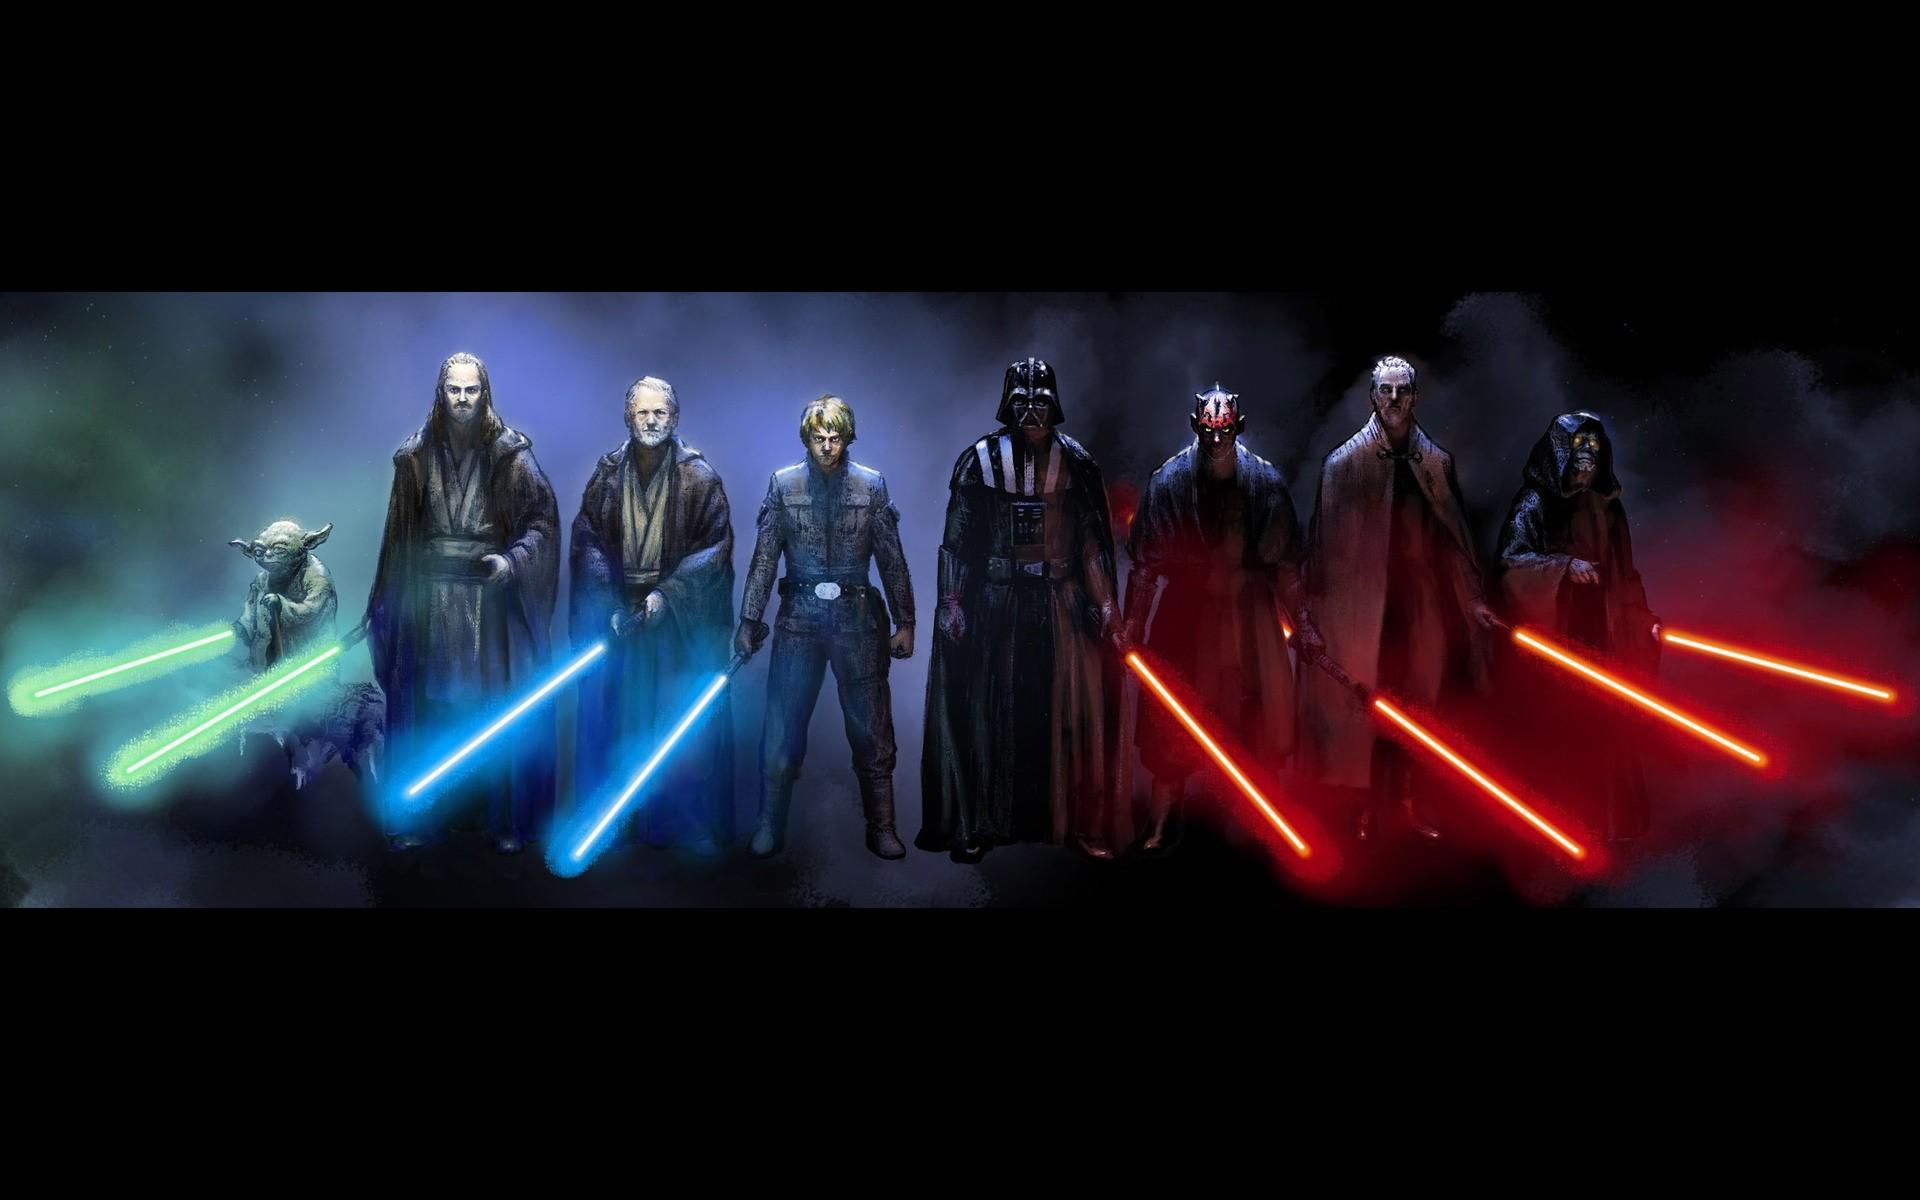 Wallpaper Star Wars Darth Vader Yoda Obi Wan Kenobi Luke